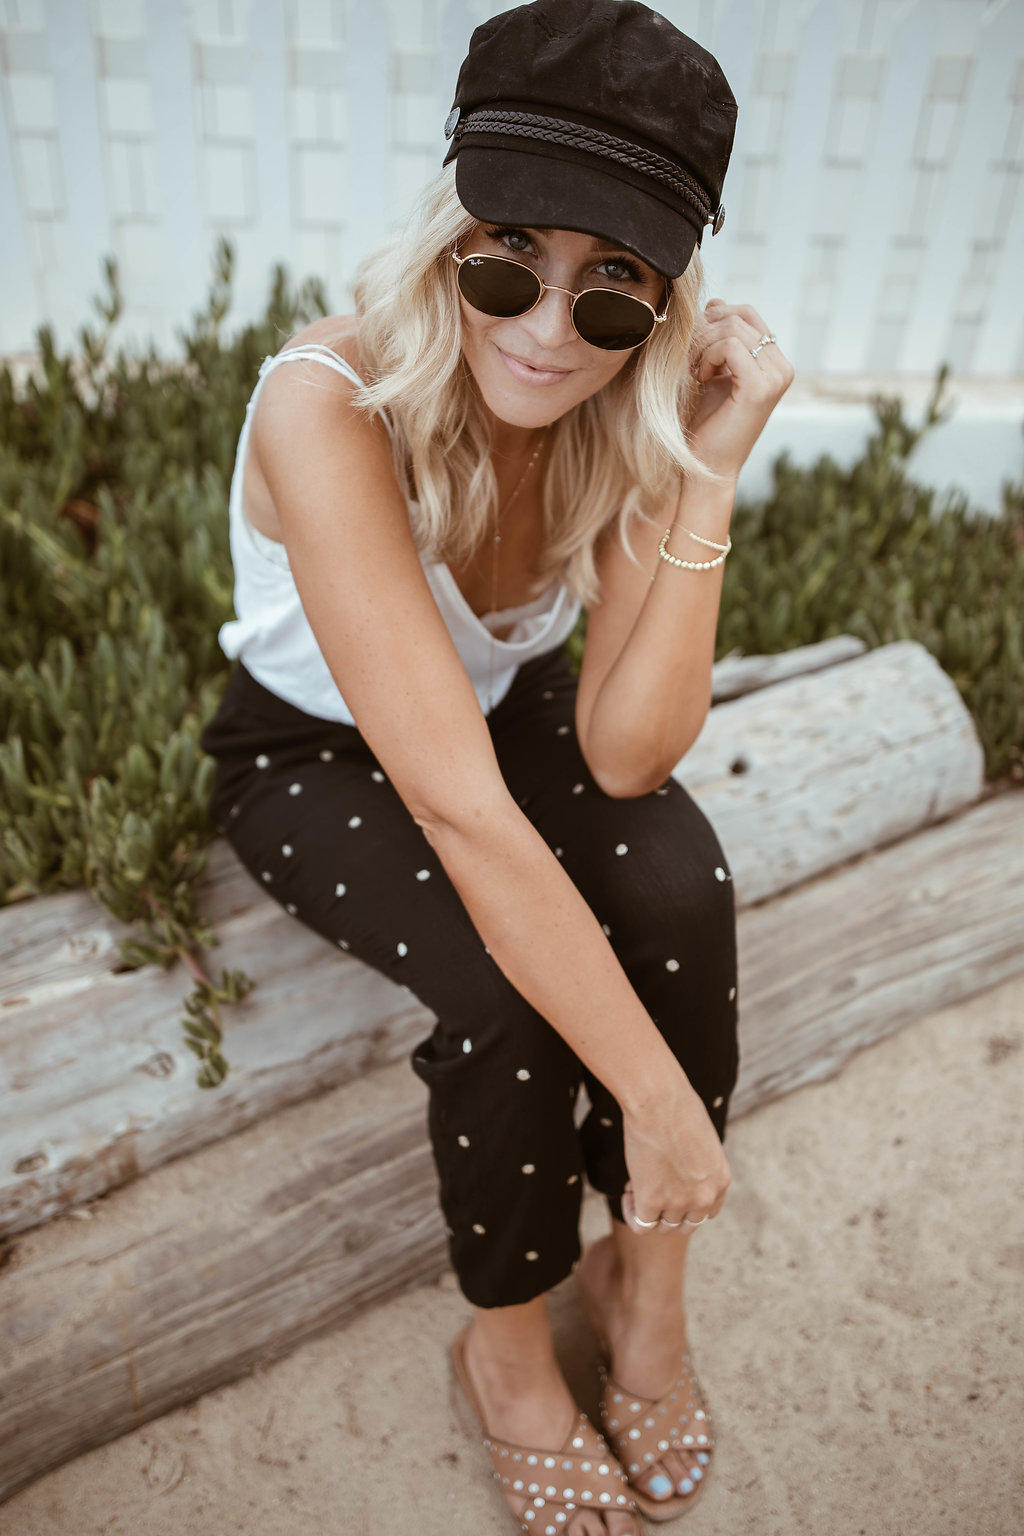 Why I Started My Blog